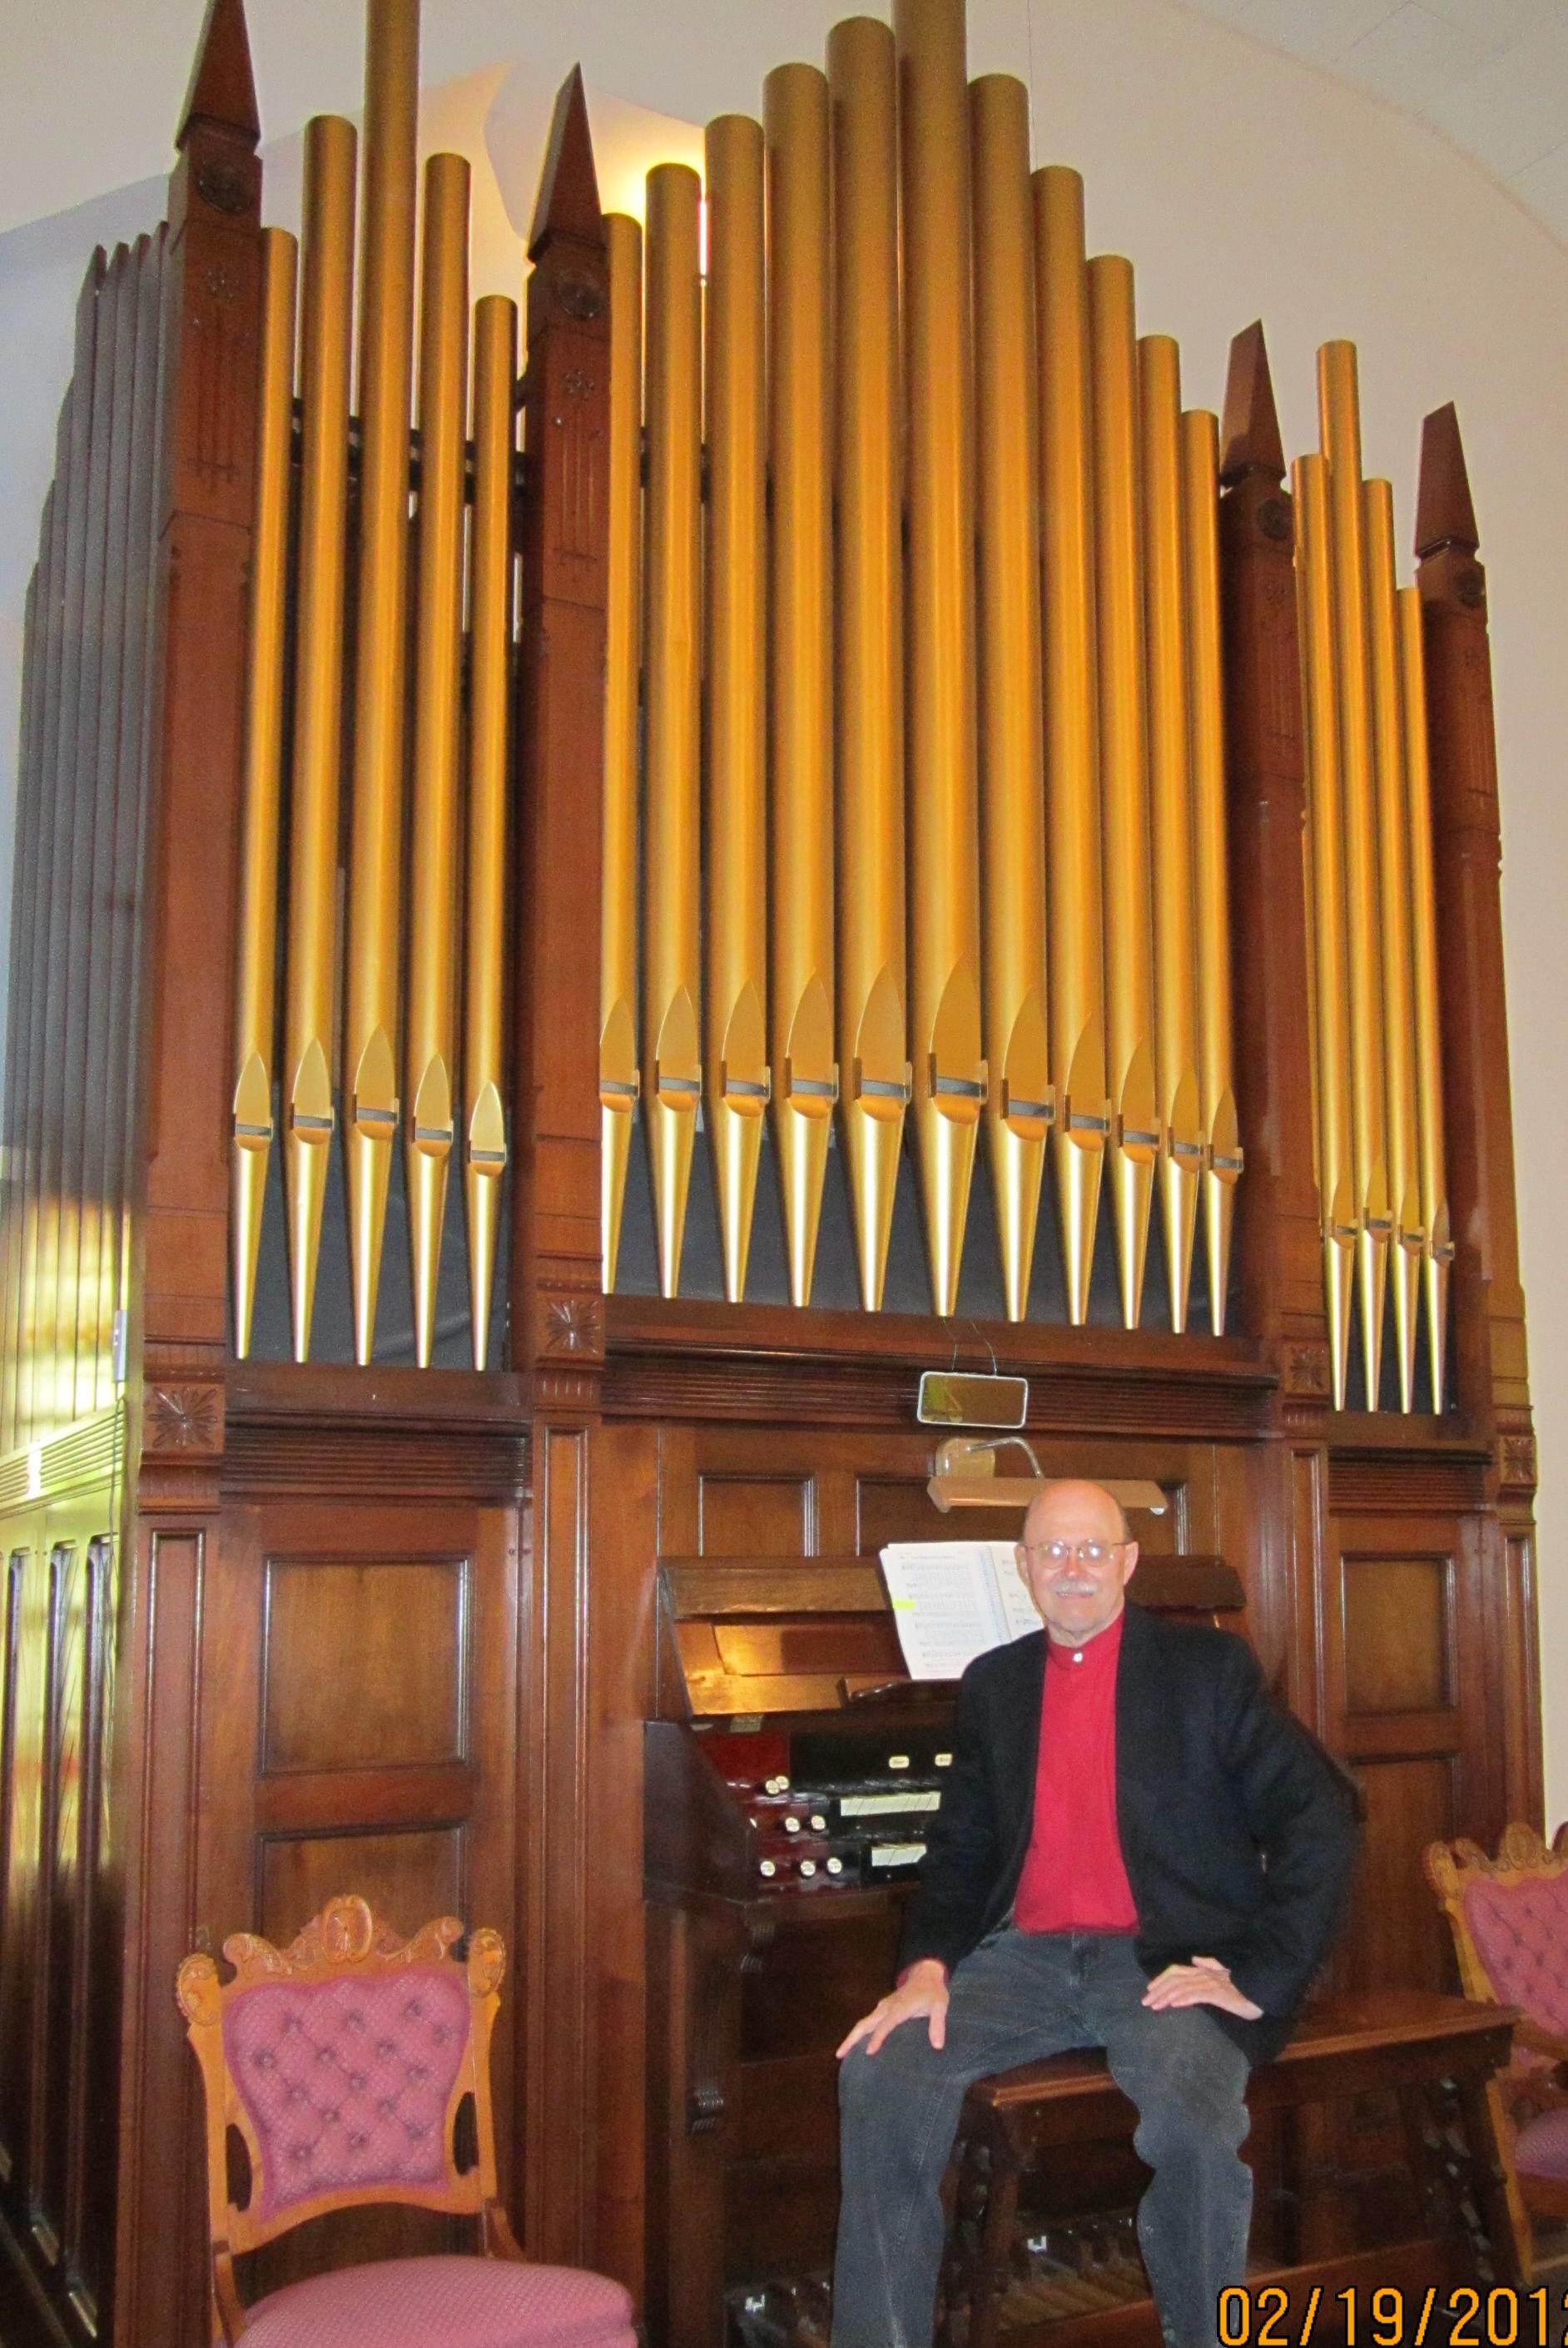 File:Pipe organ at Kirksville Christian Church.jpg